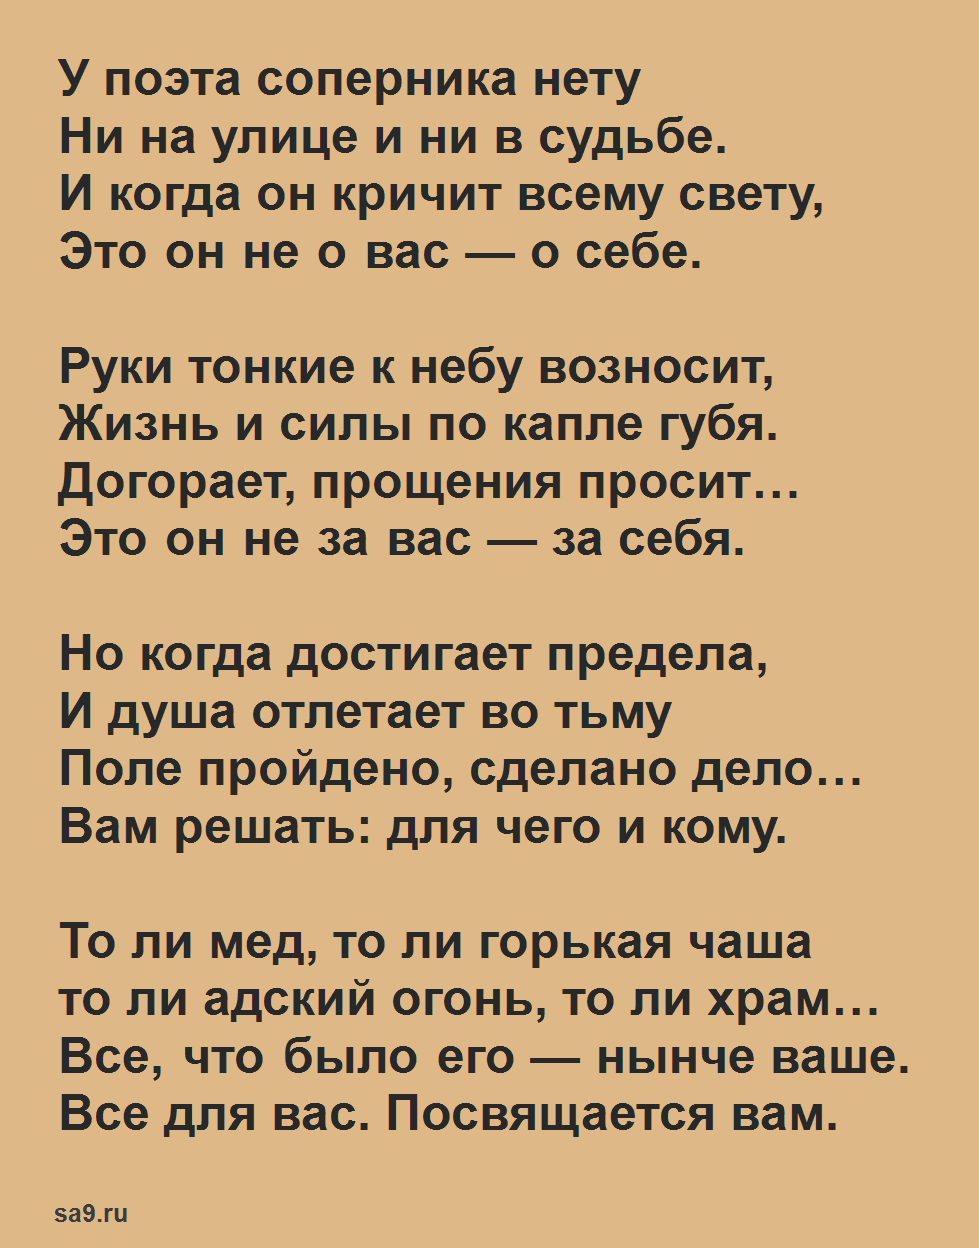 Окуджава стихи 16 строк - У поэта соперника нету